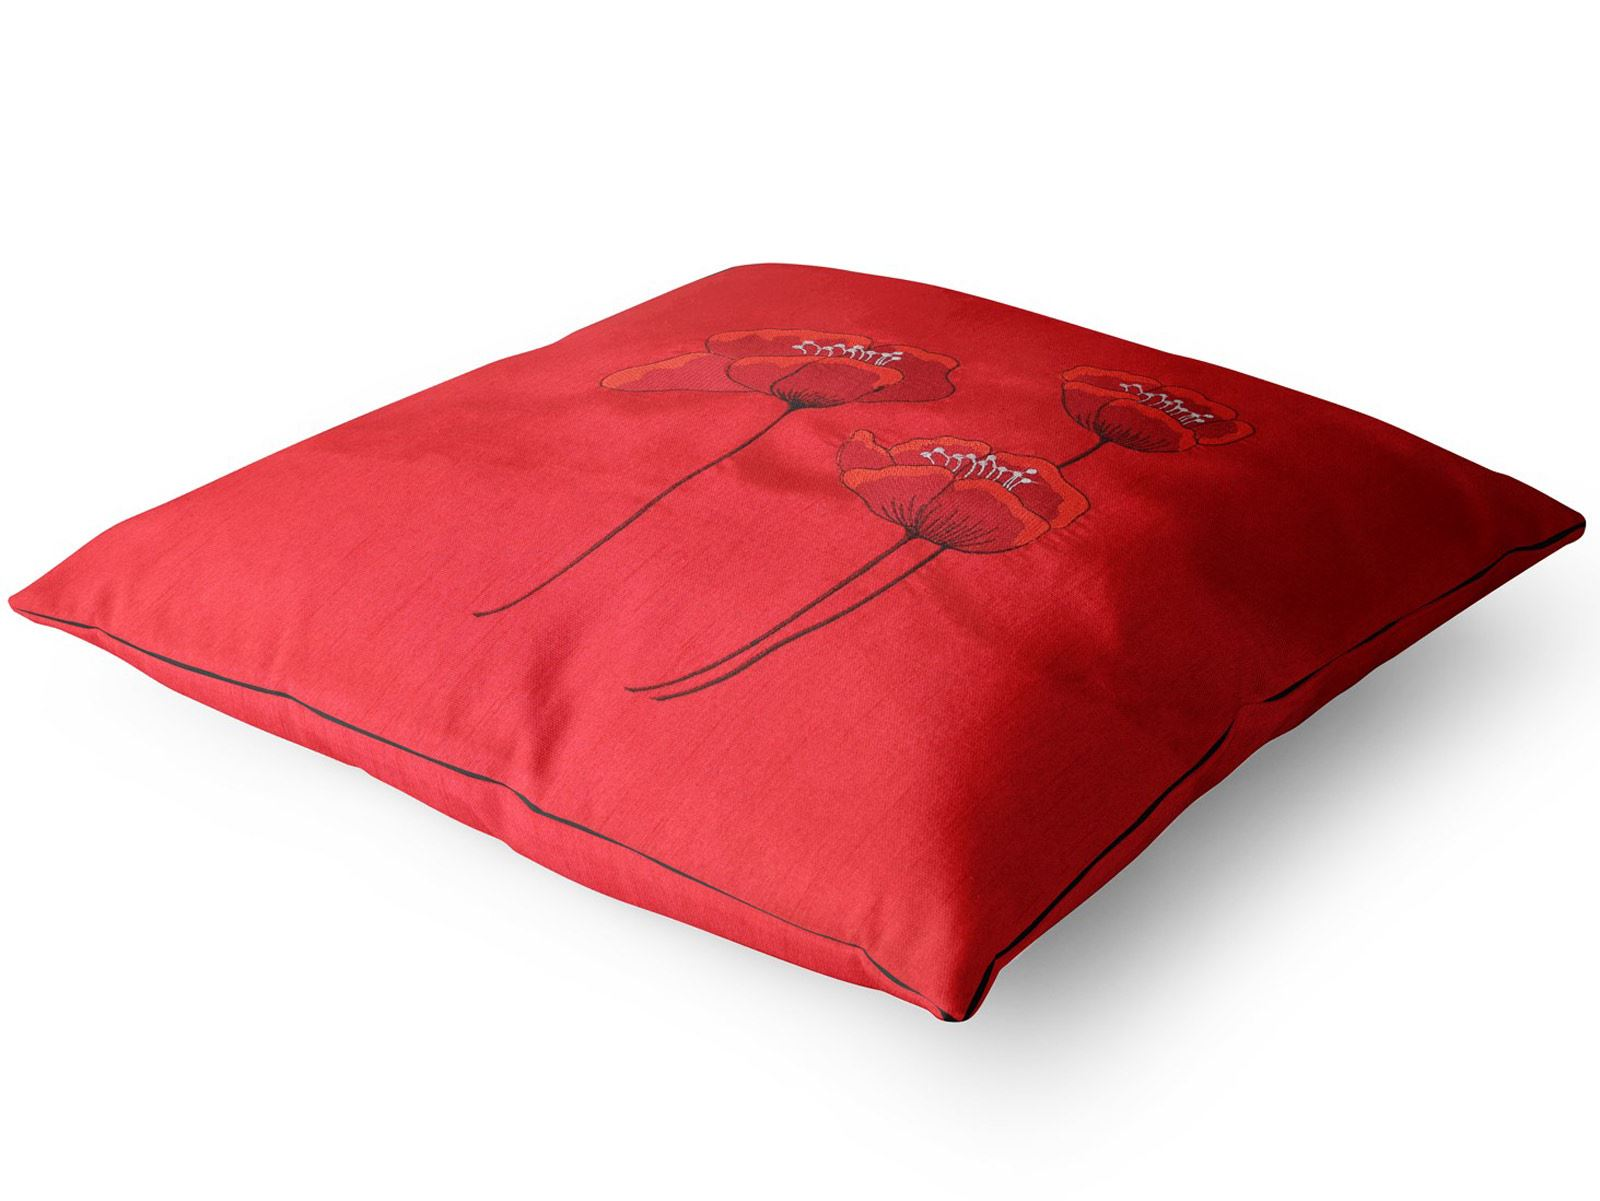 Vino-Tinto-Cushion-Covers-Coleccion-17-034-18-034-43cm-45cm-Cubierta miniatura 32